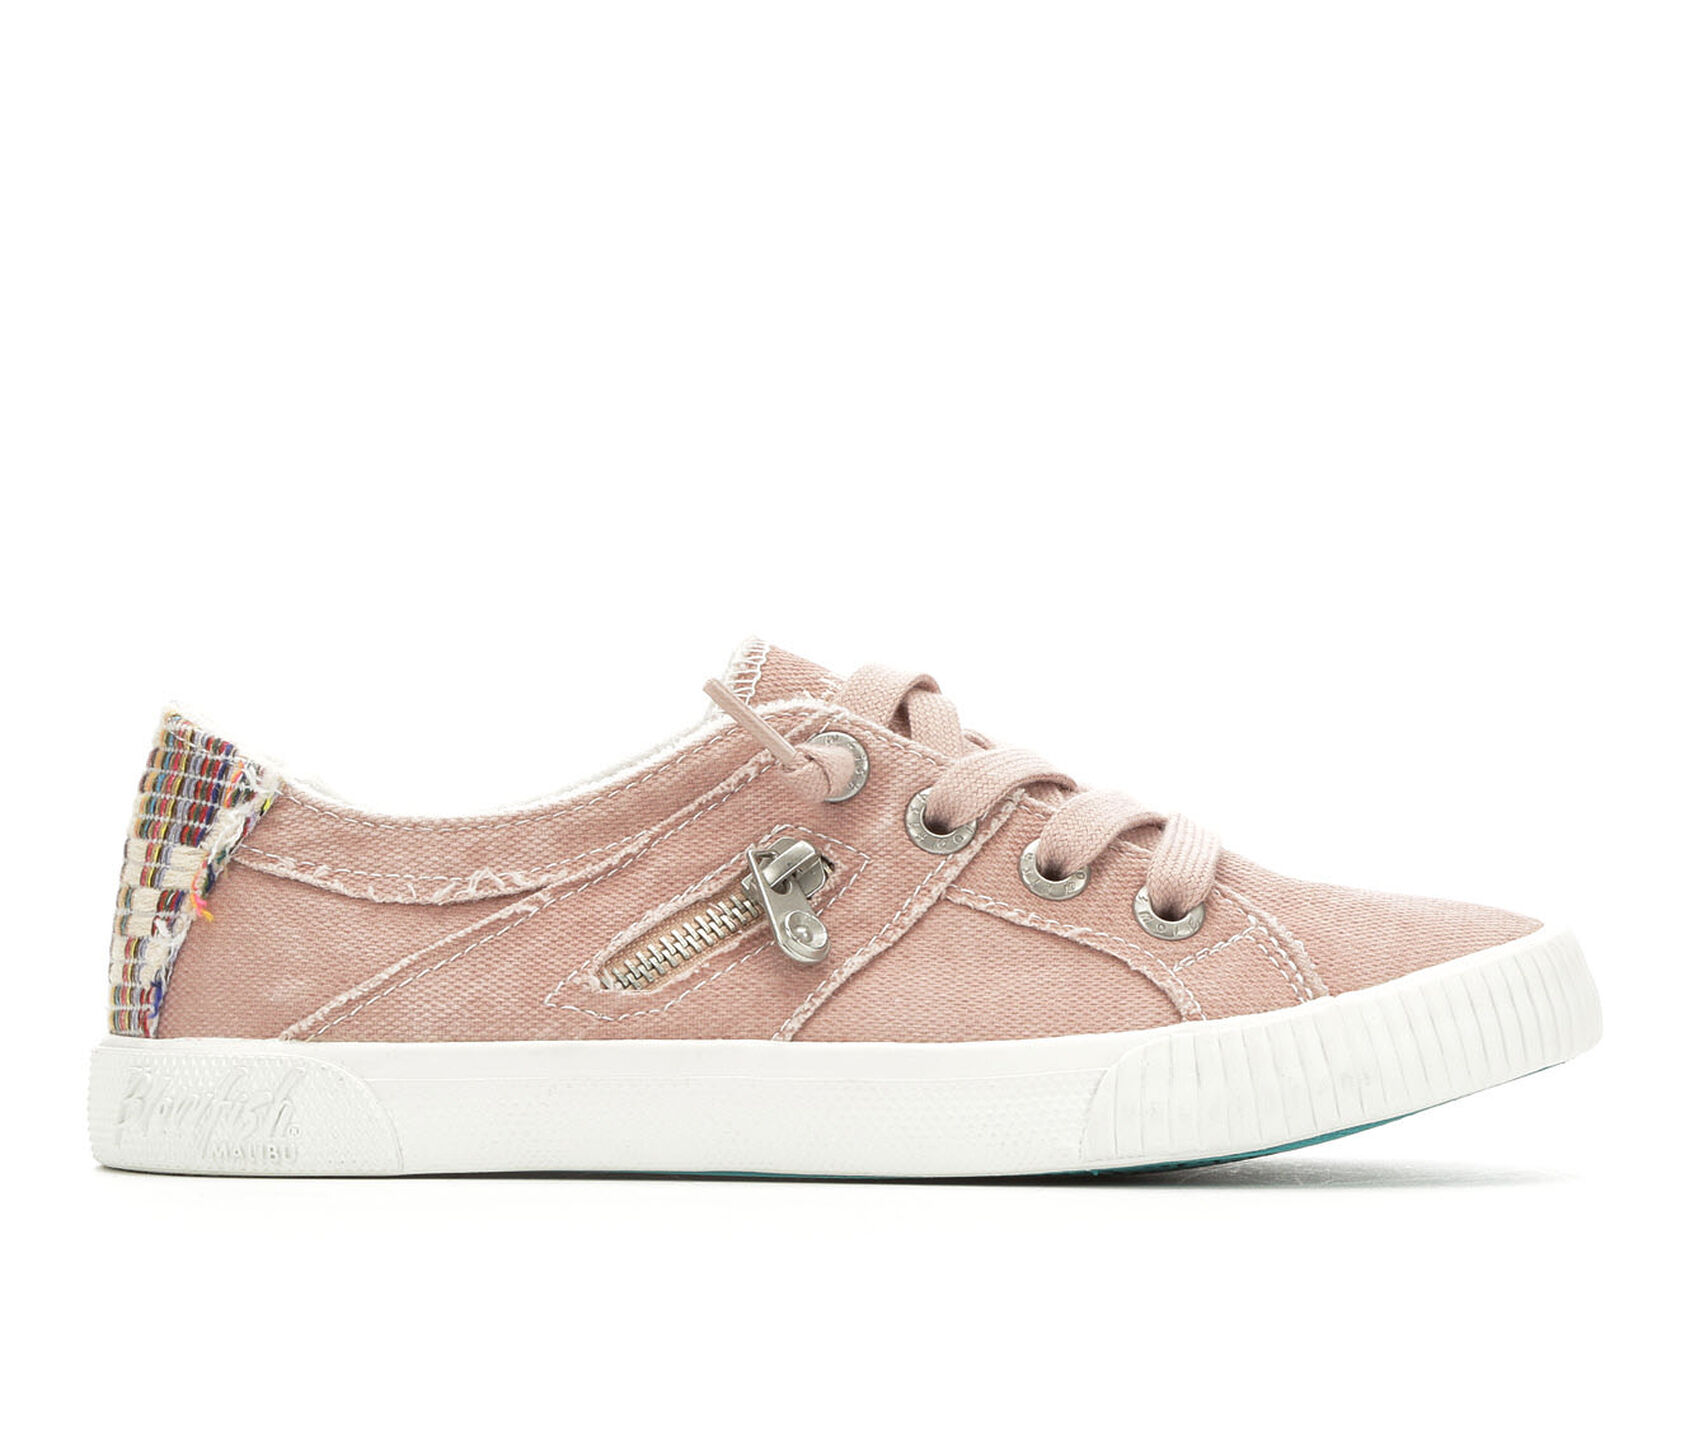 d3e034d7d5972 Women's Blowfish Malibu Fruit Sneakers